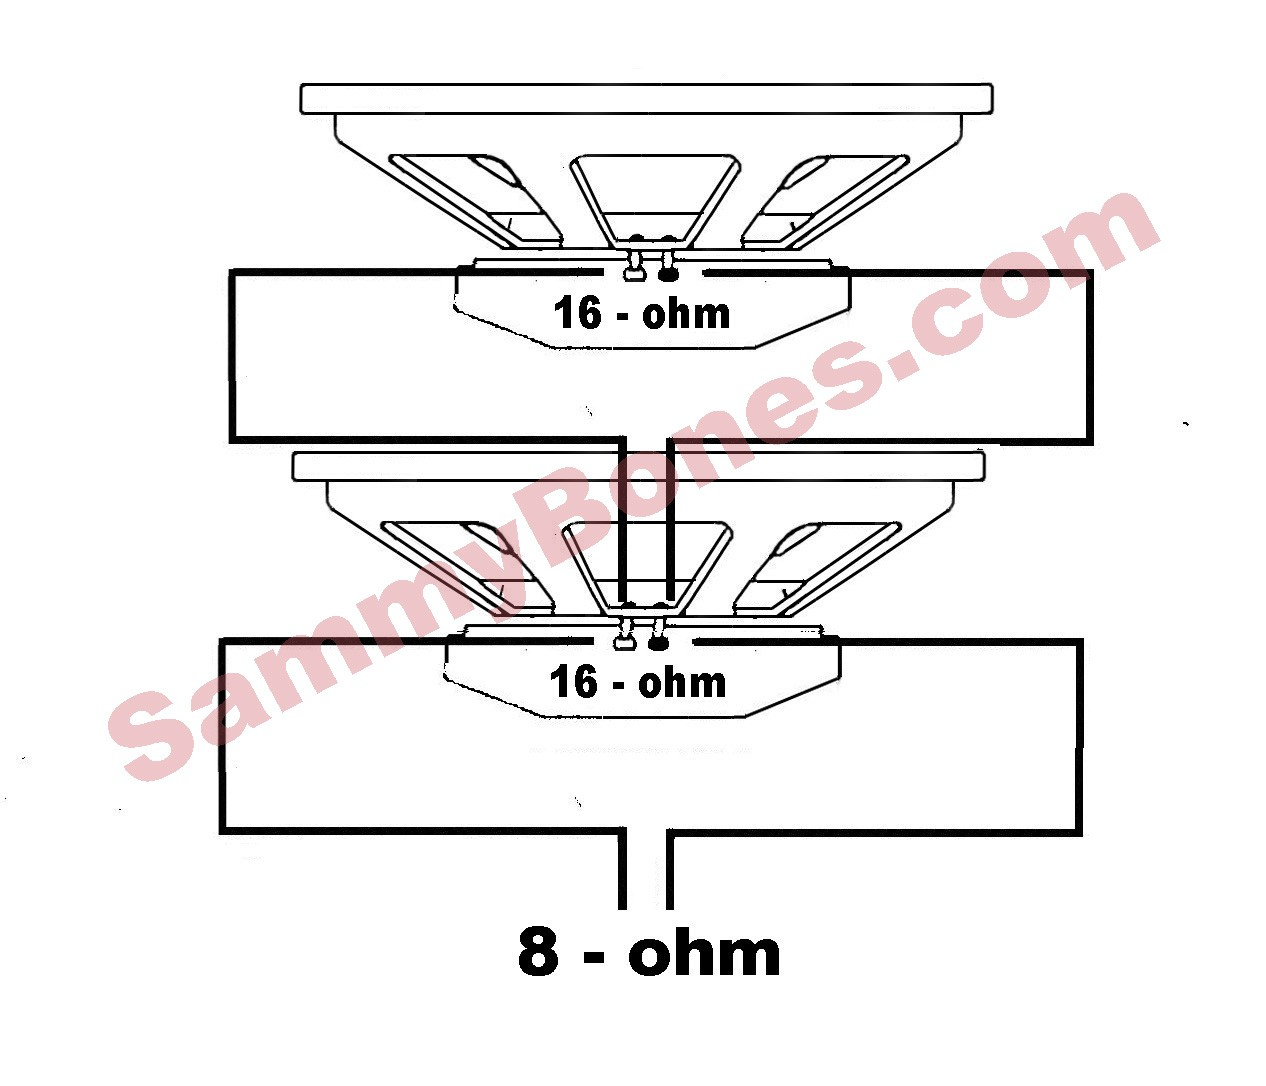 4x12 wiring diagram